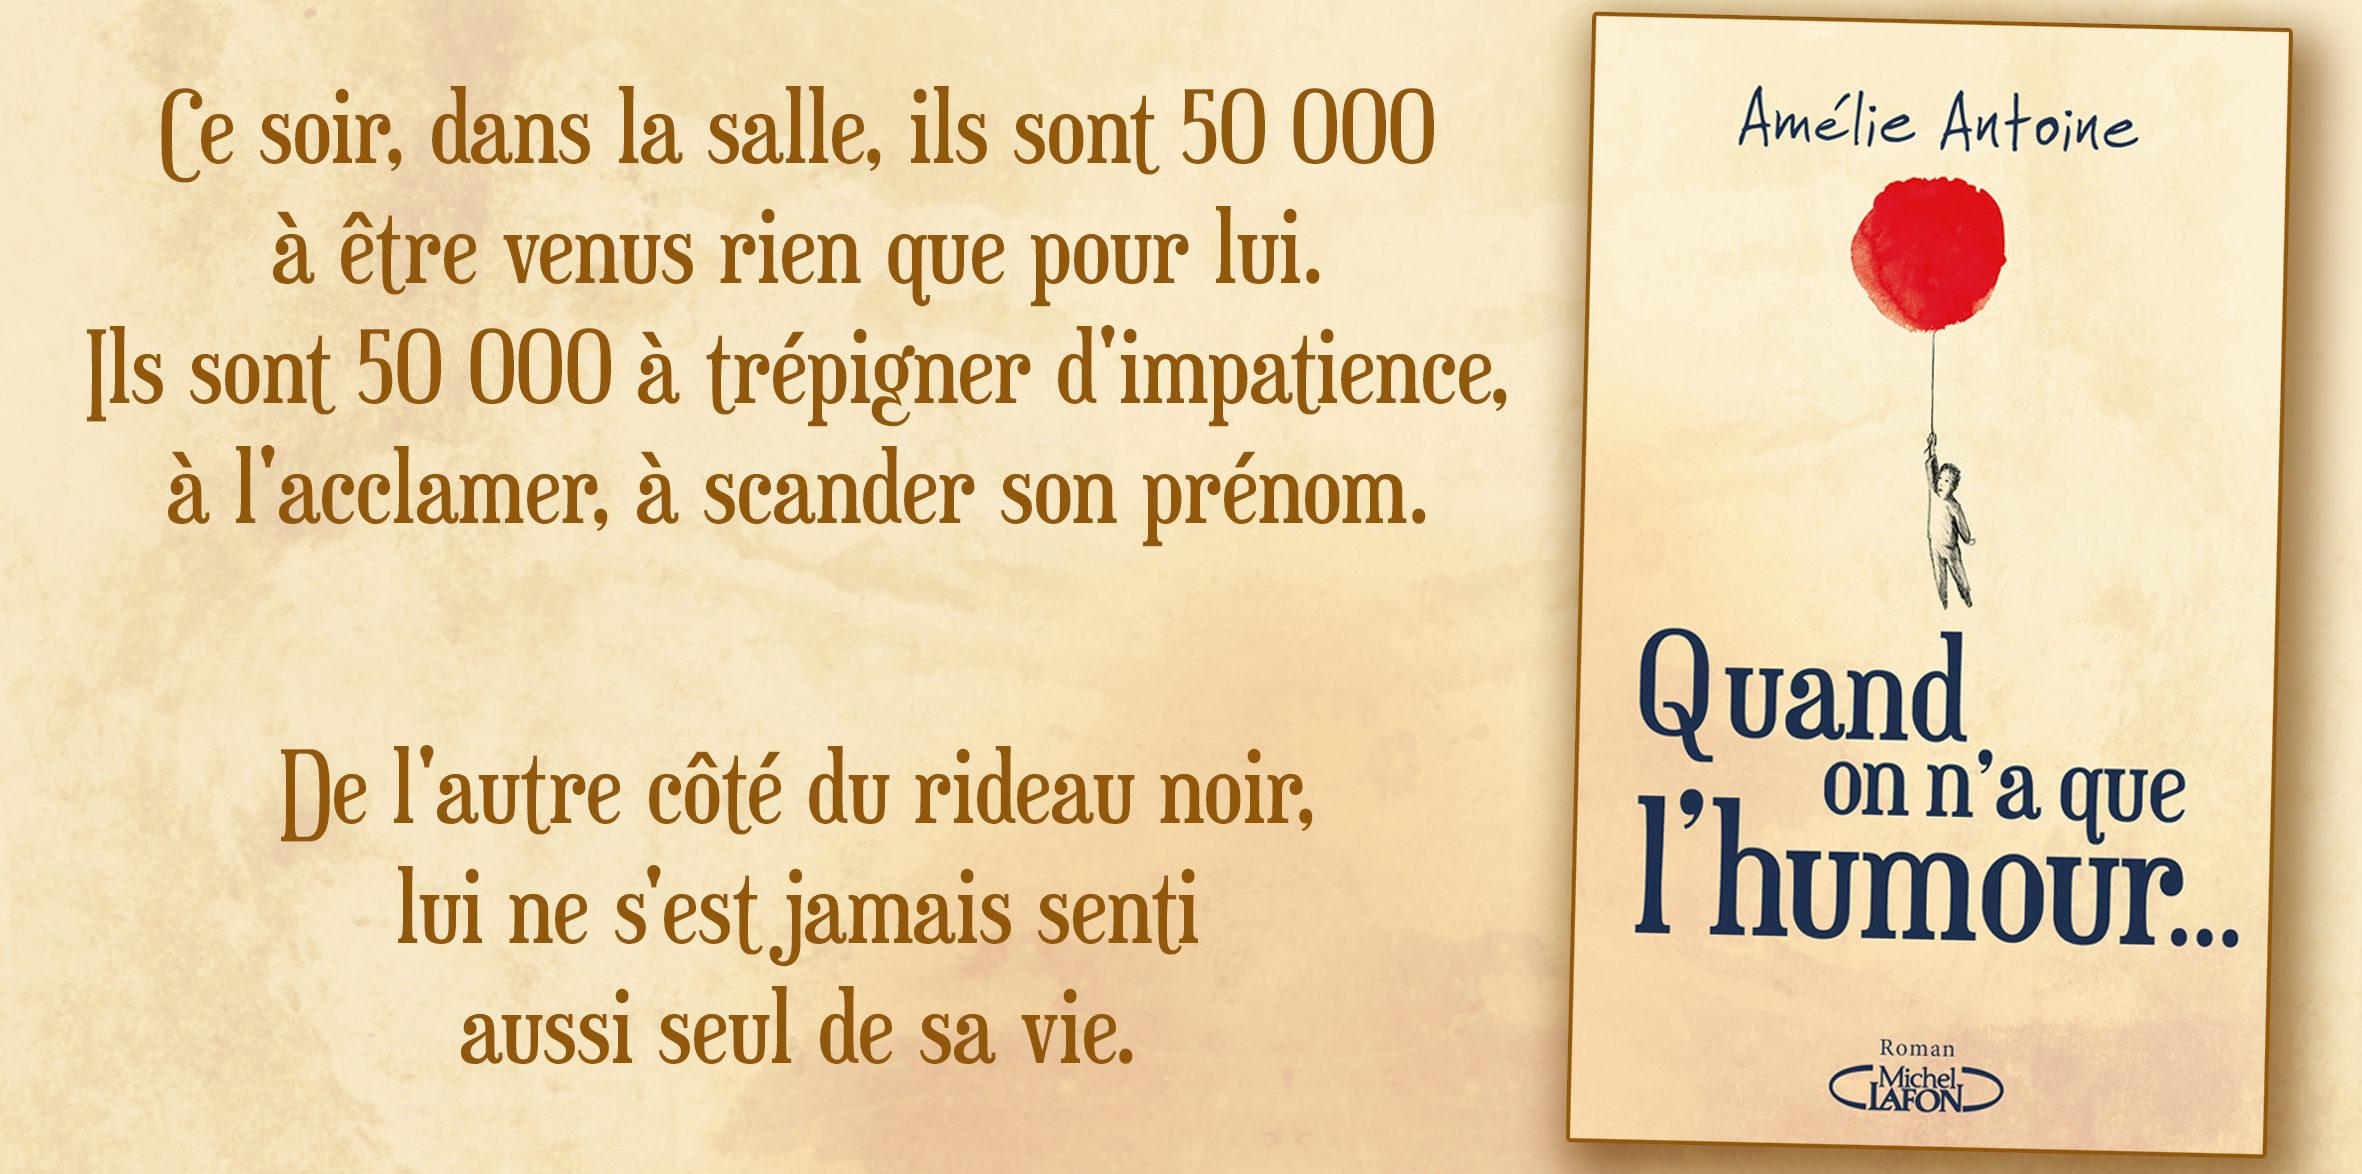 Amelie Antoine Quand on n'a que l'humour